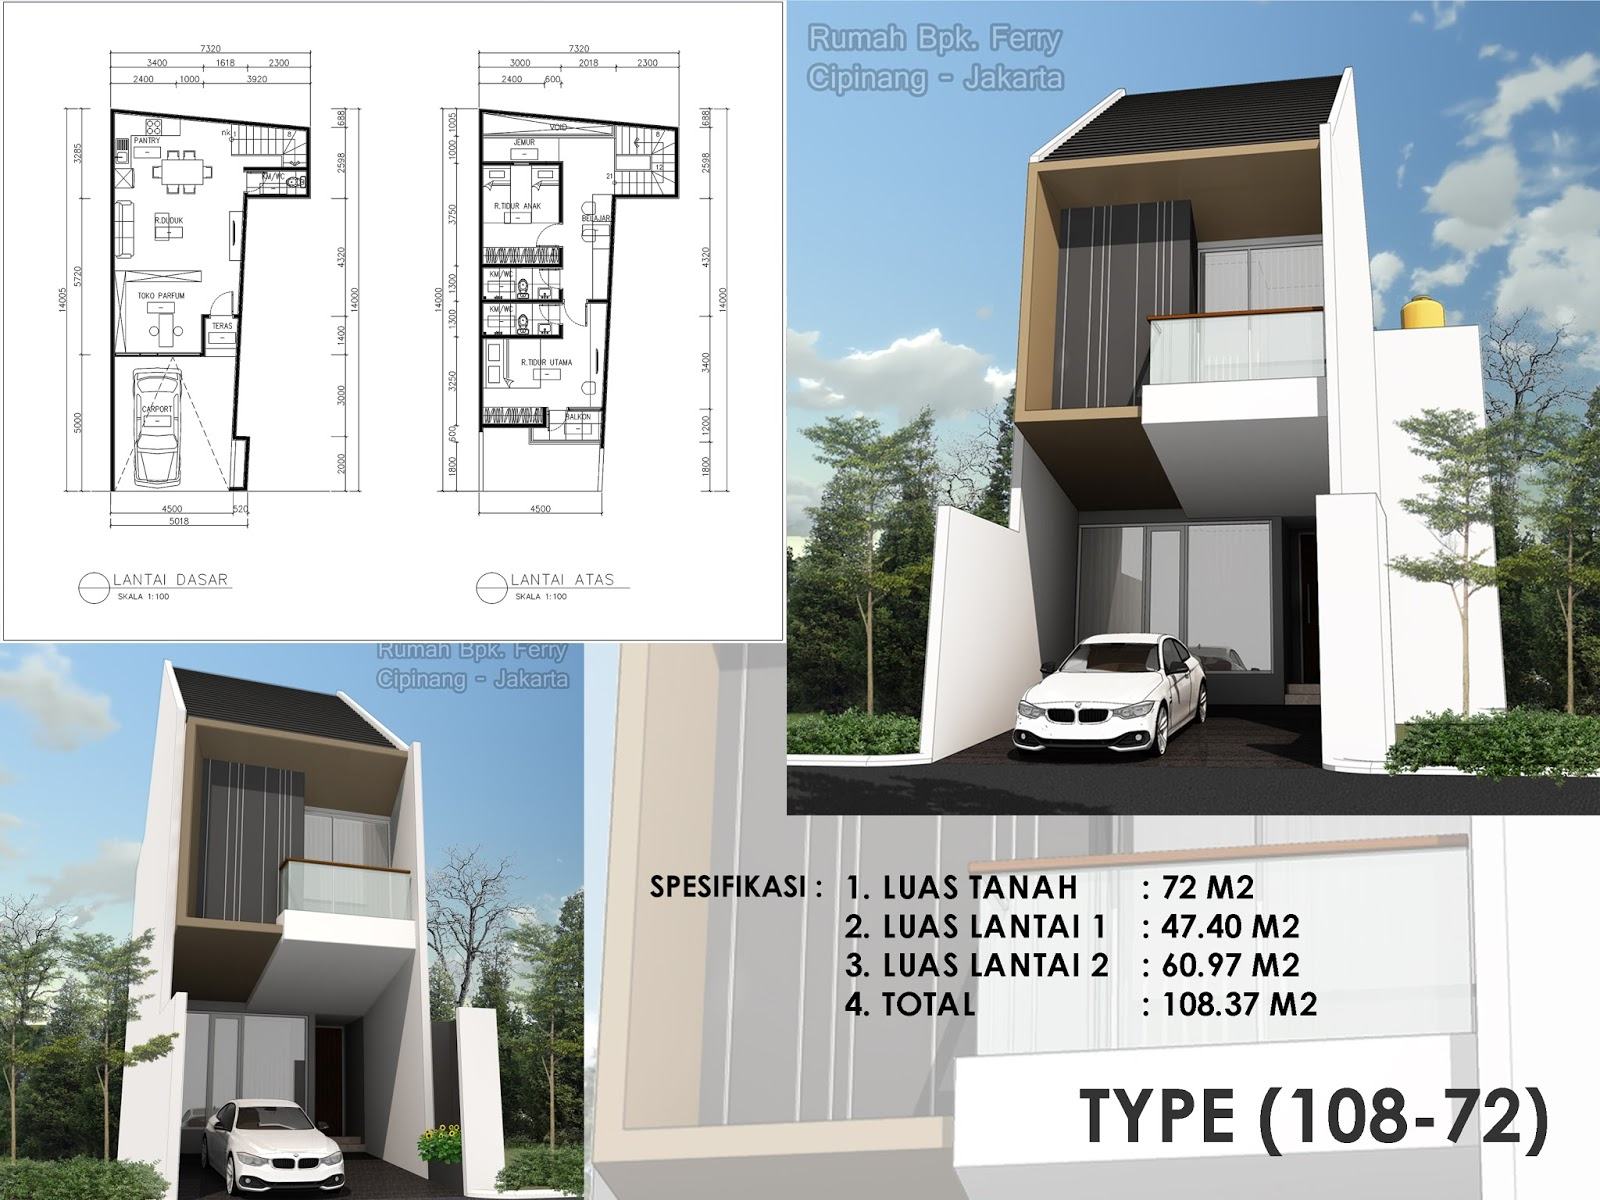 Jasa Arsitek Desain Bangun Desain Rumah Minimalis 2 Lantai